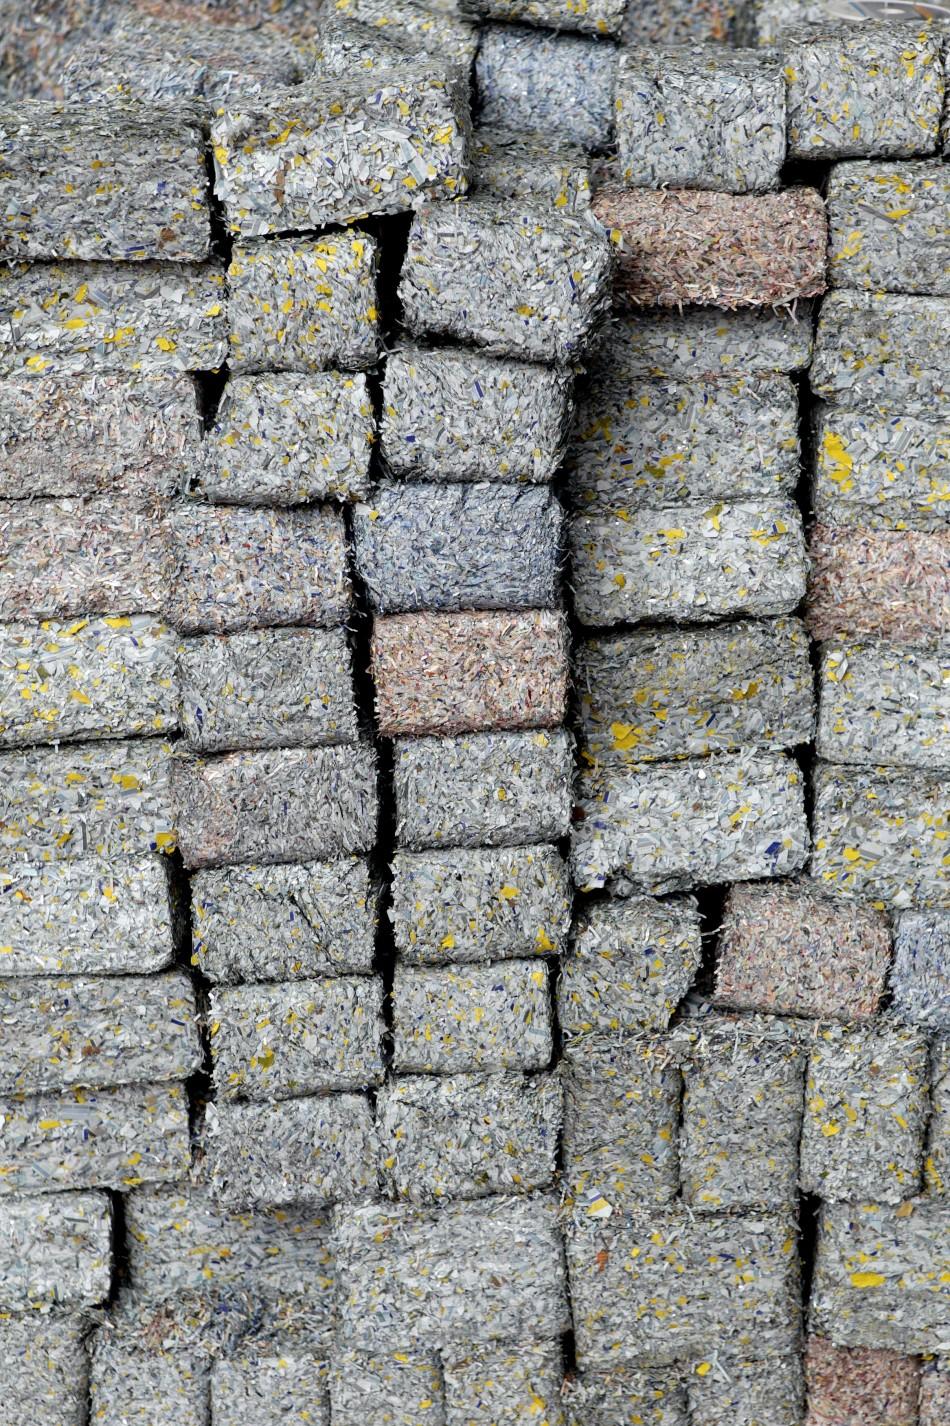 Bricks of shredded money are stacked in the 1.4 billion home.